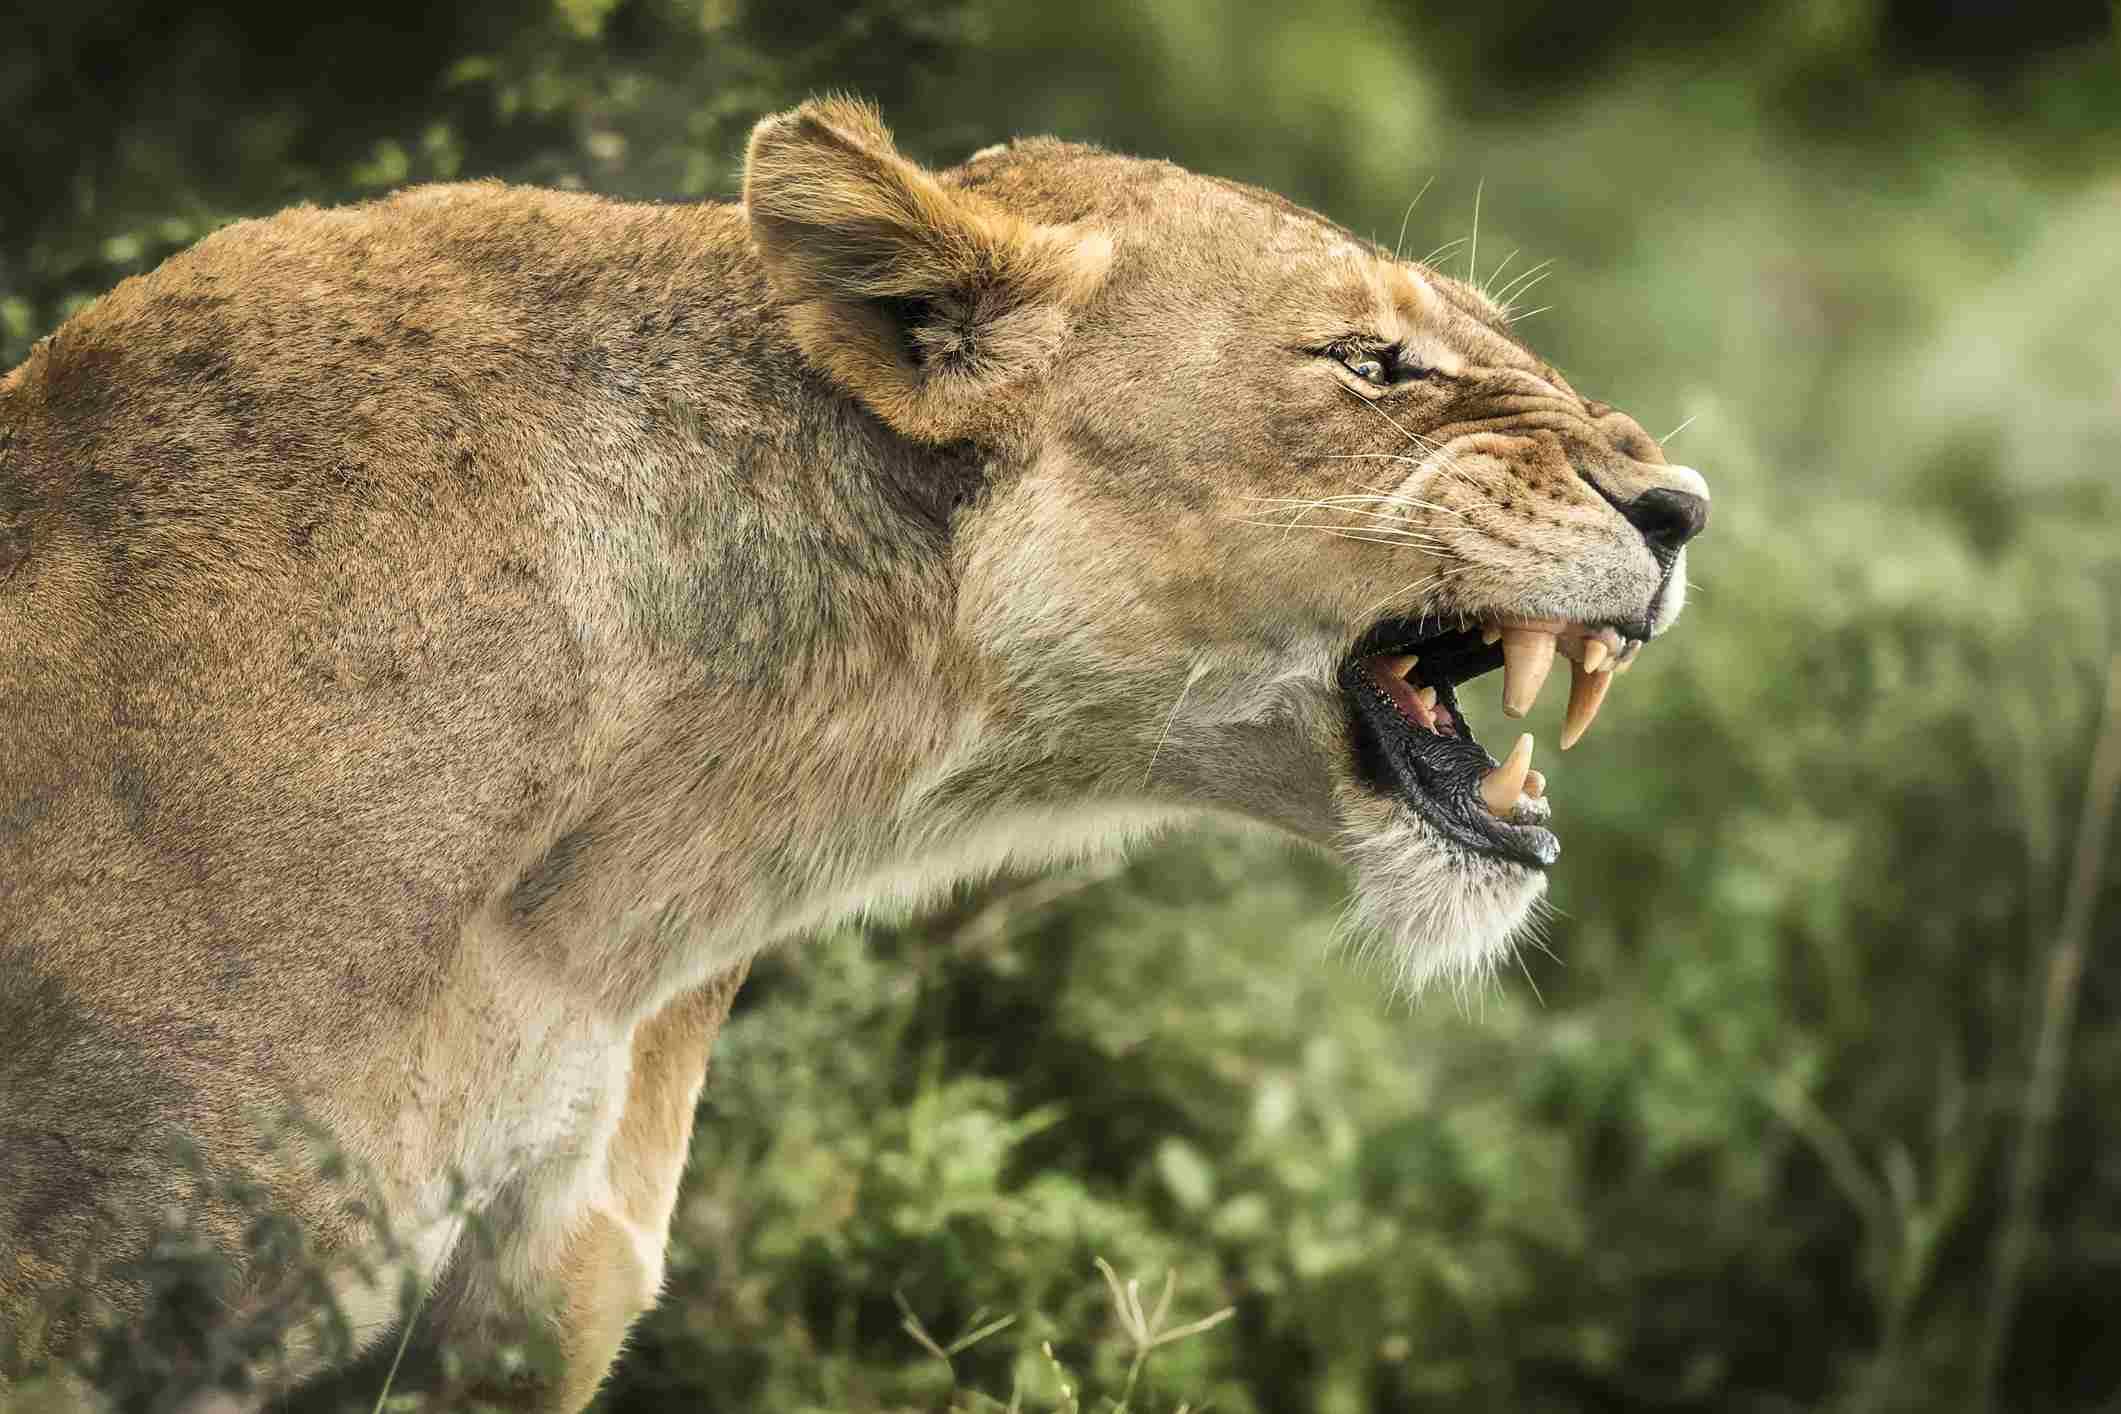 Lioness in Tsavo National Park, Kenya